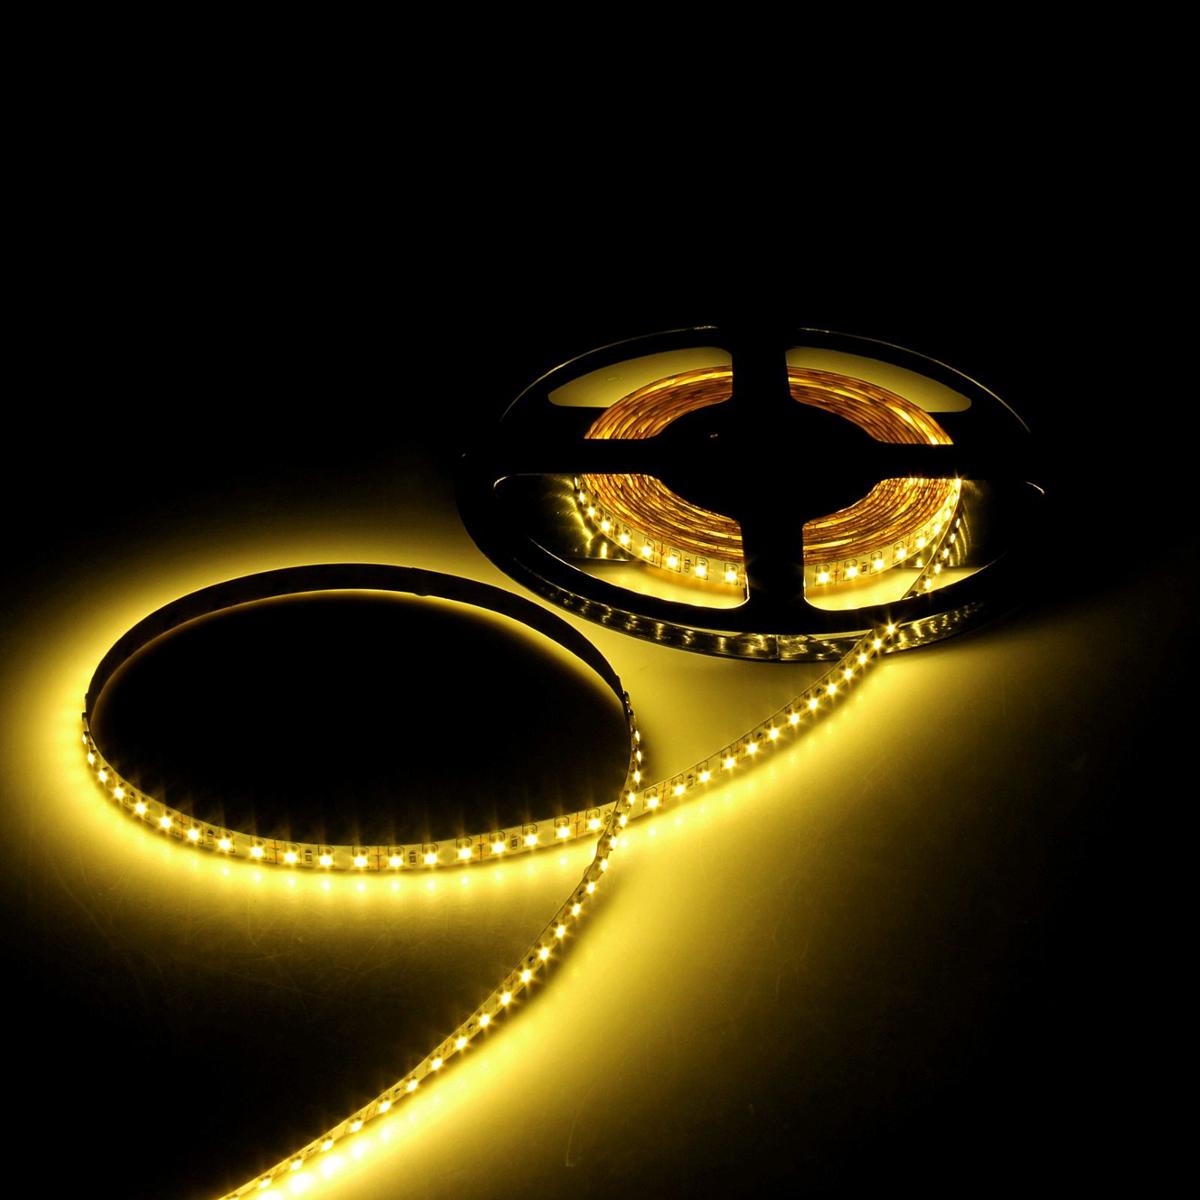 Светодиодная лента Luazon, 12В, SMD3528, длина 5 м, IP65, 120 LED ламп, 9.6 Вт/м, 6-7 Лм/1 LED, DC, цвет: желтый. 883902